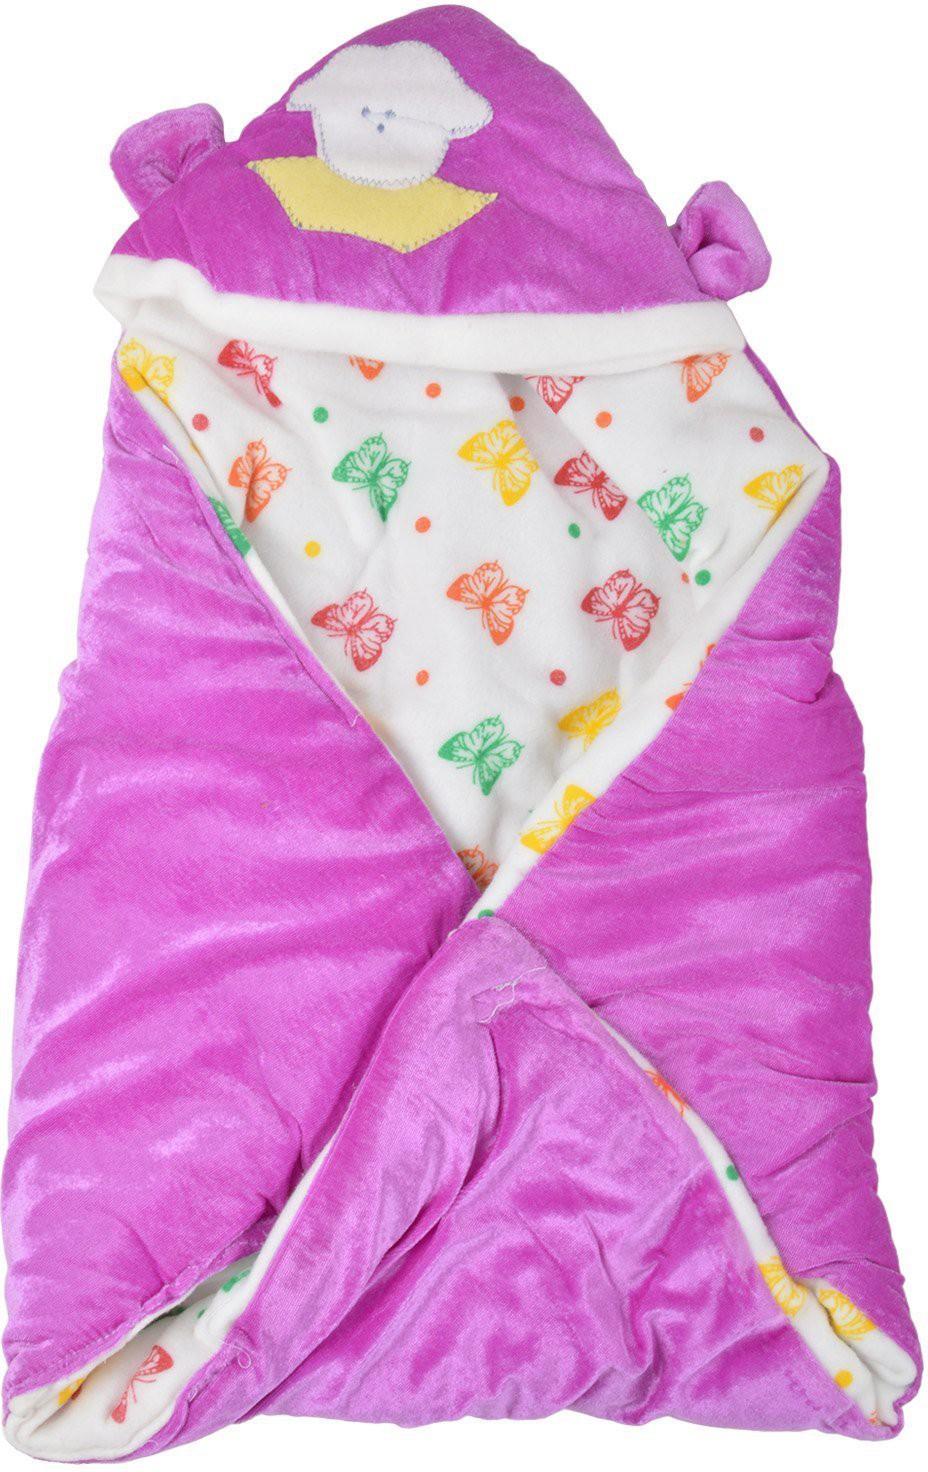 Baby bed online flipkart - Star Trendz Animal Crib Dohar Purple